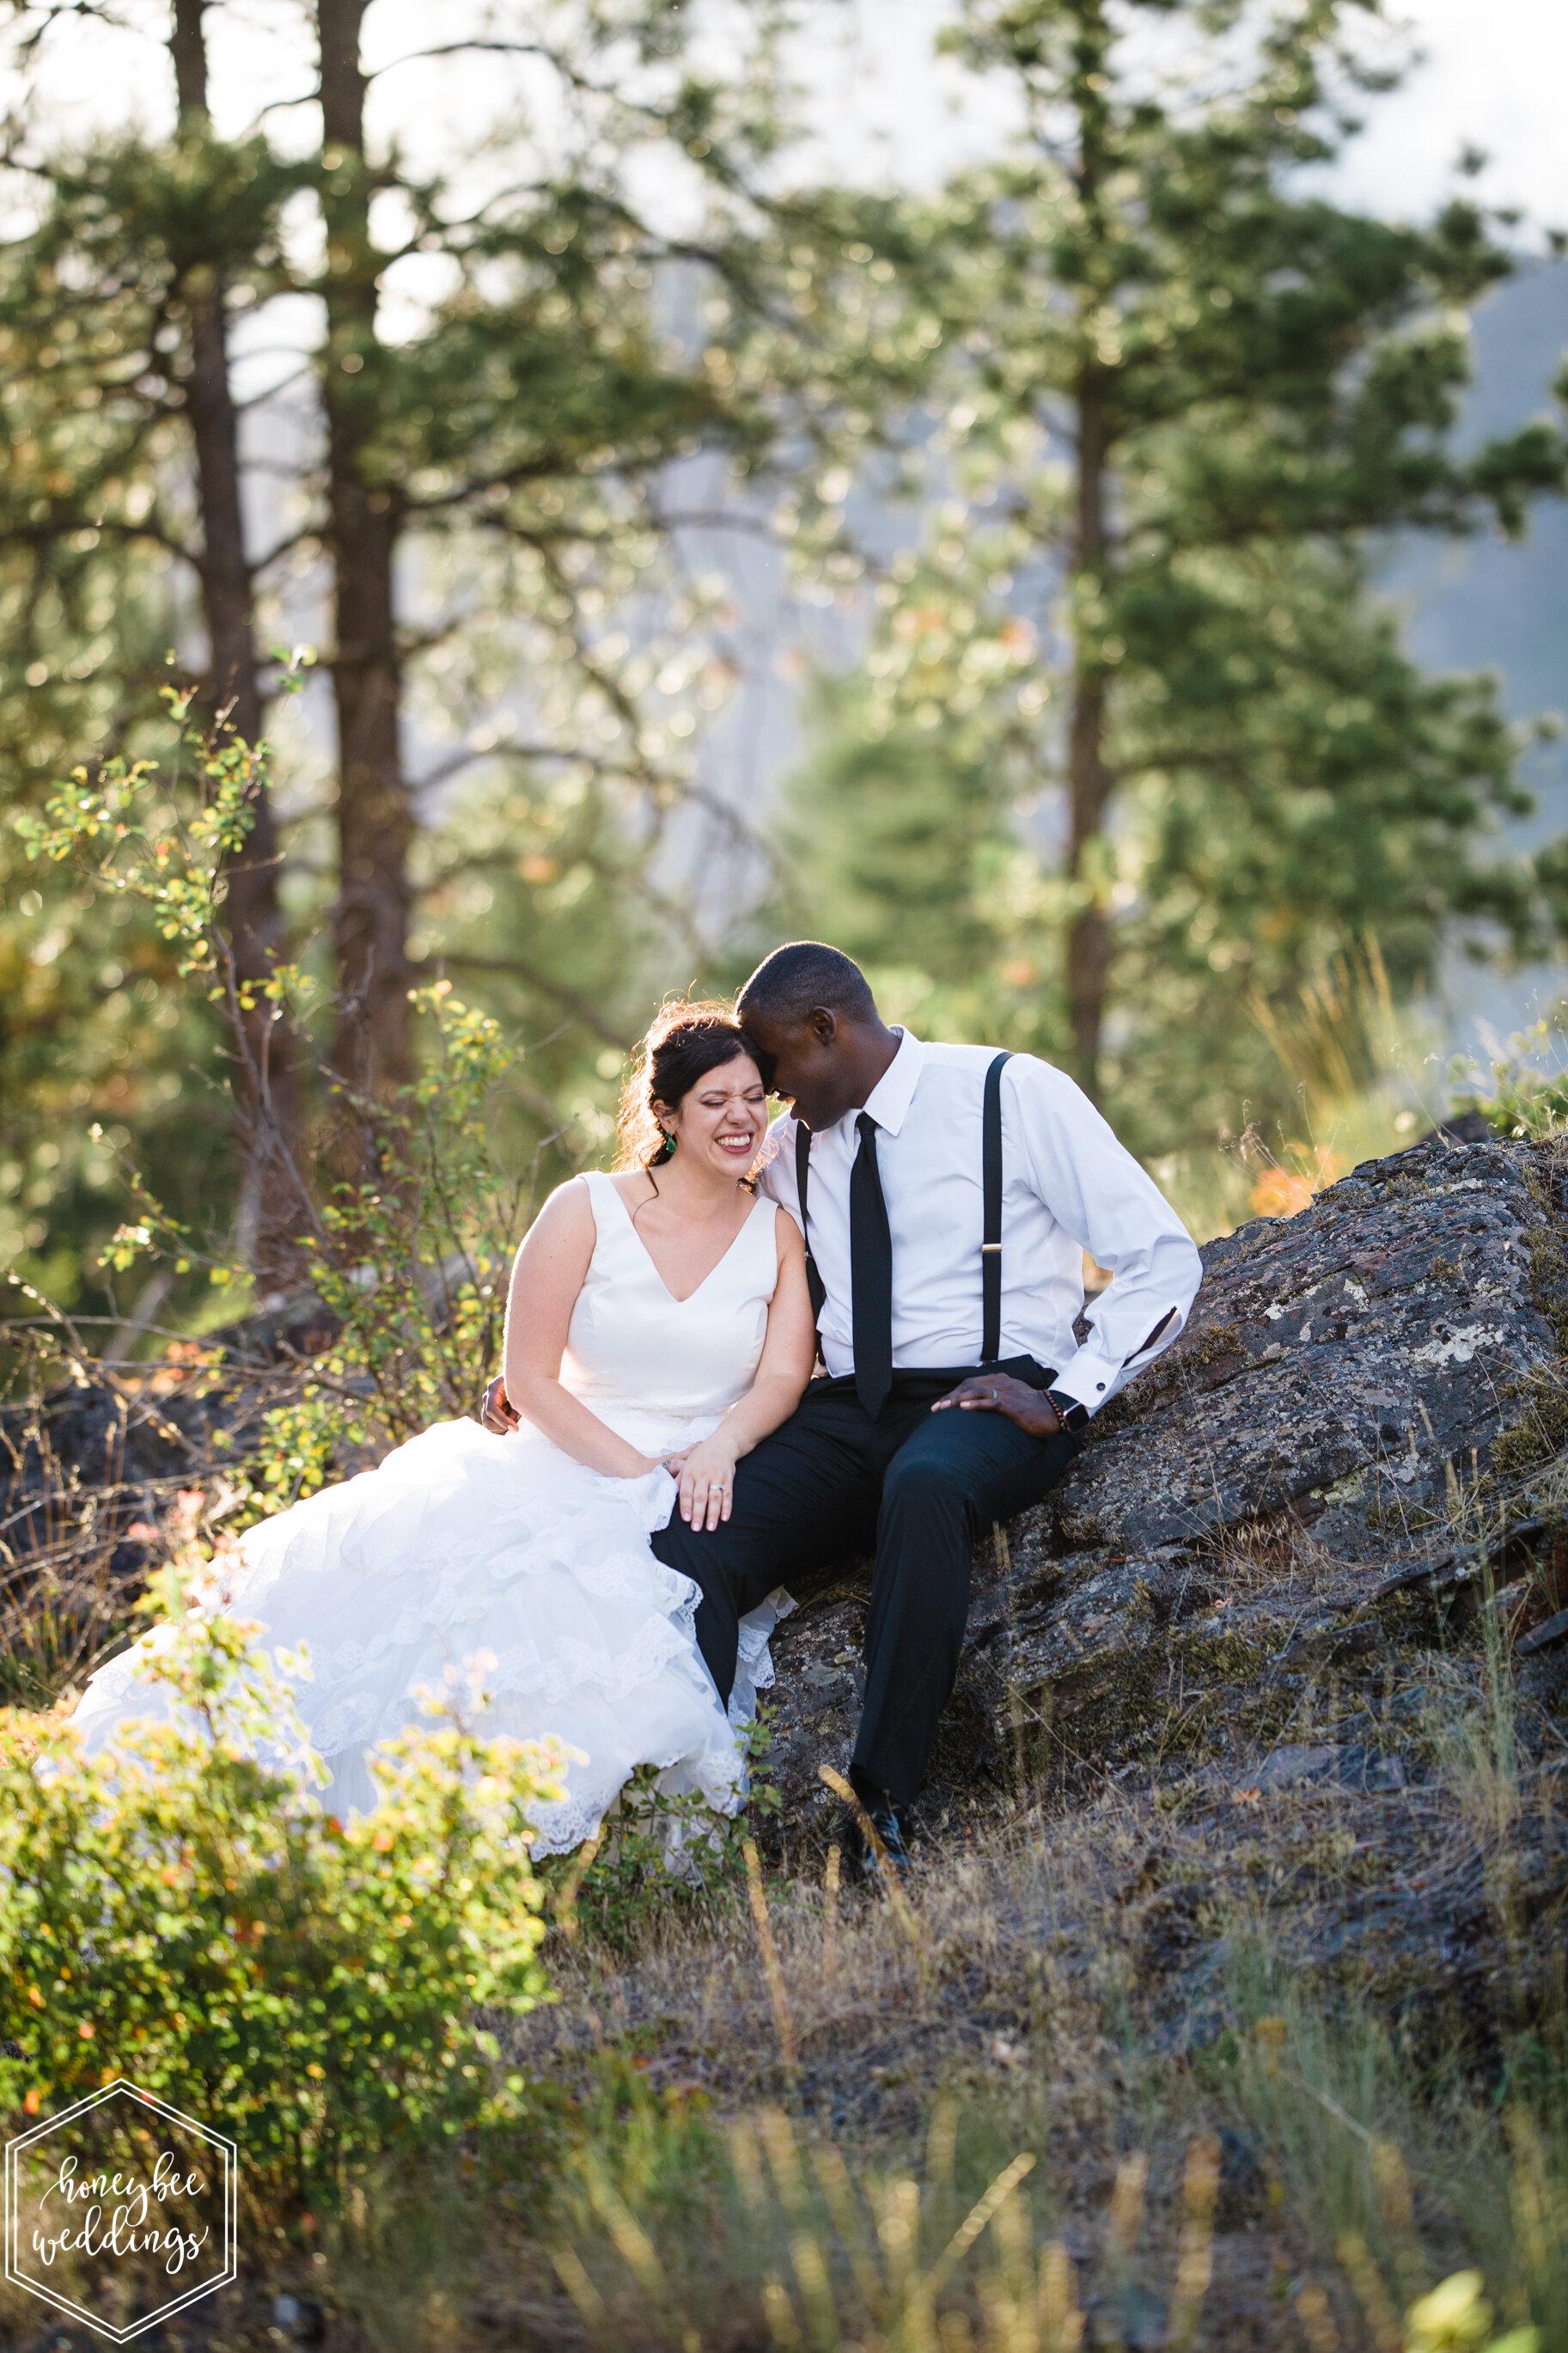 186White Raven Wedding_Montana Wedding Photographer_Rebekah & Likom_Honeybee Weddings_July 27, 2019-3416.jpg